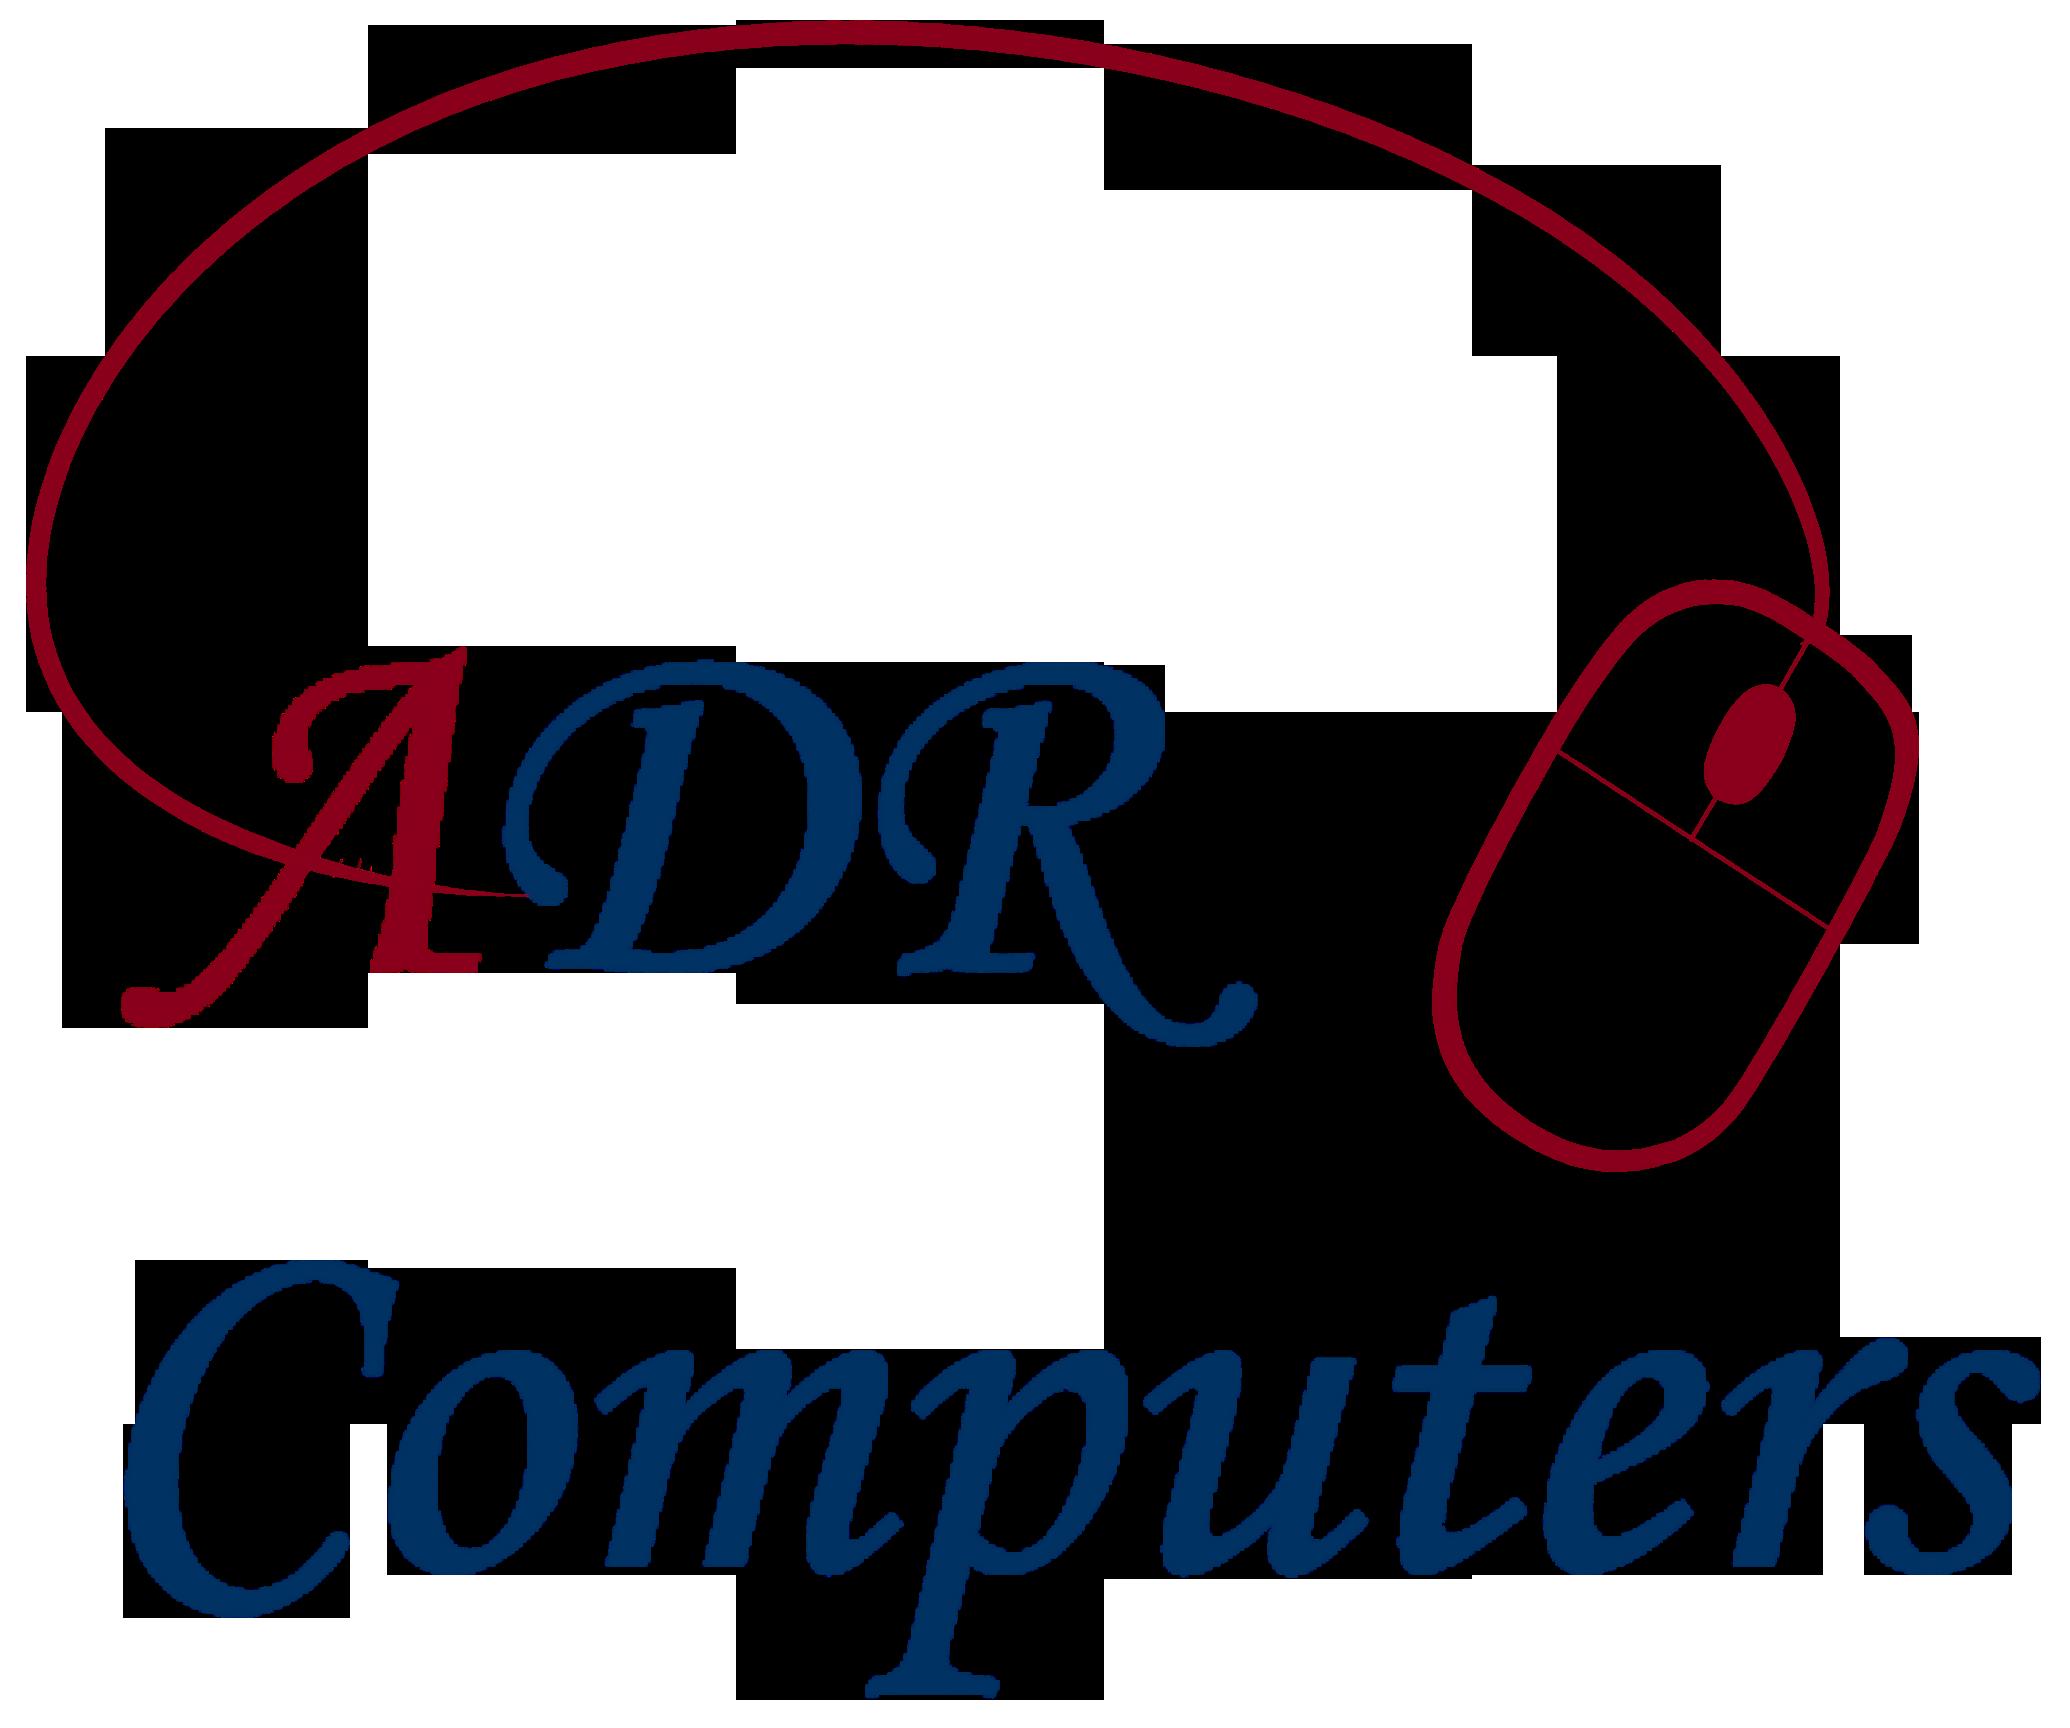 ADR Computers